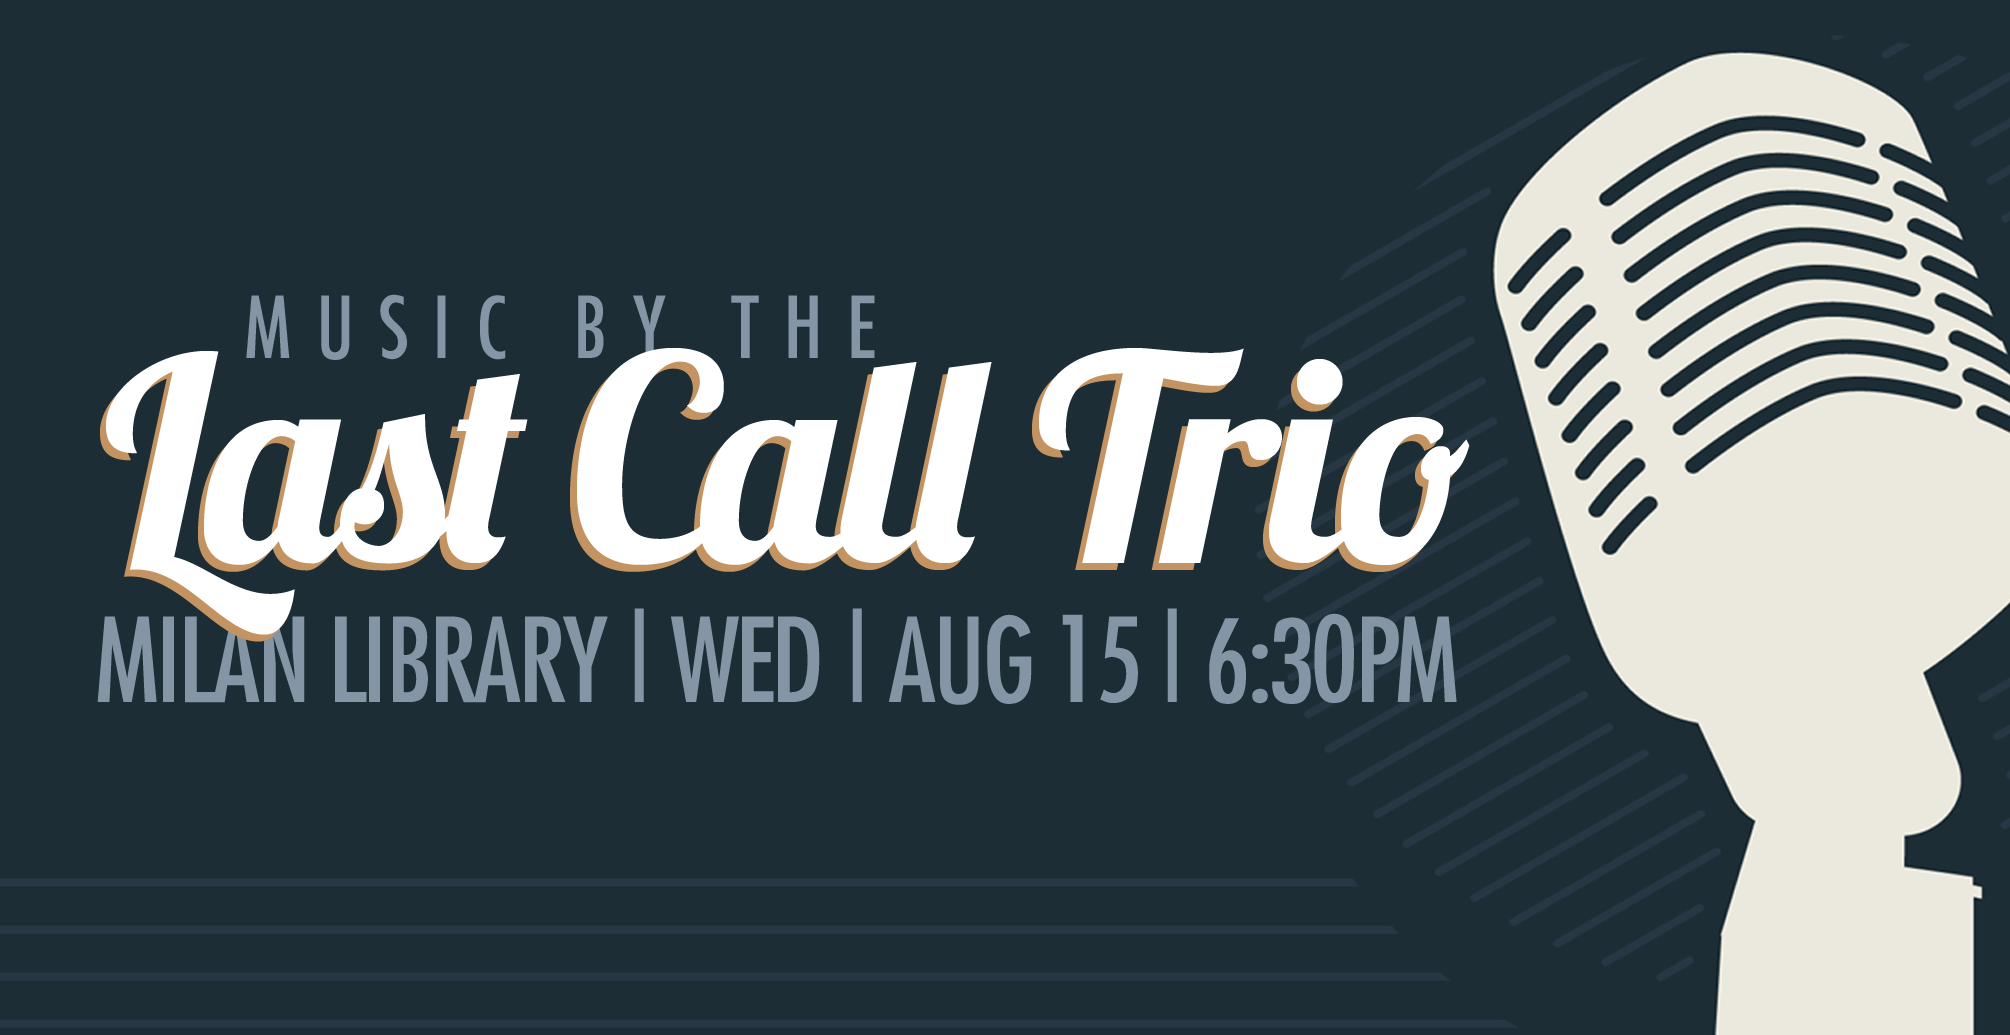 2018-08-ADULT-Milan-Last-Call-Trio-Slide